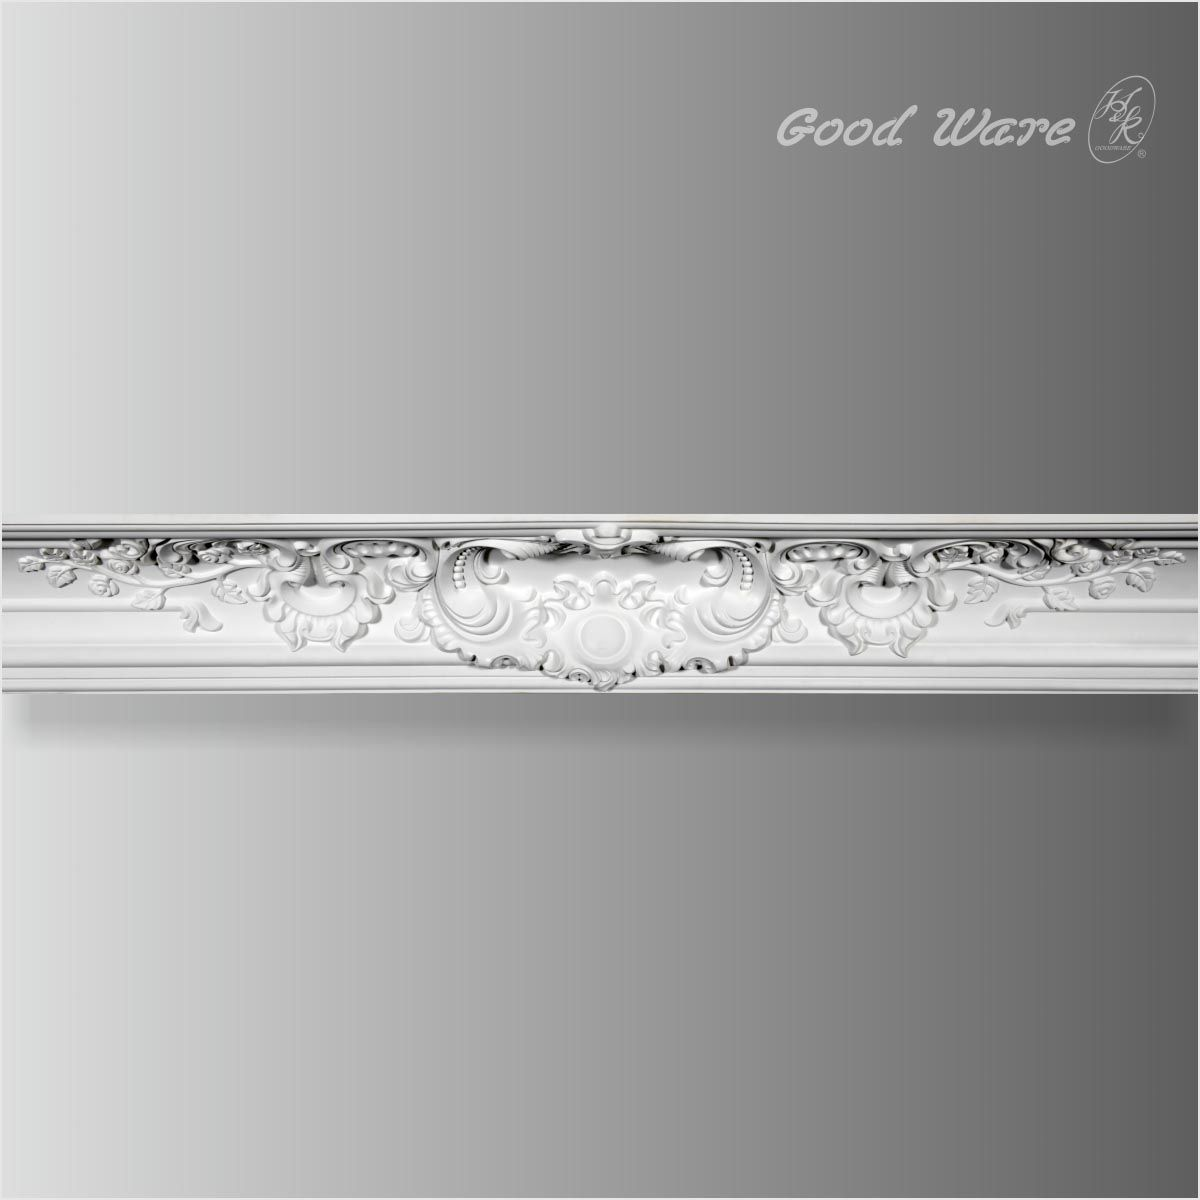 Polyurethane decorative center molding supplier | Crown Molding in